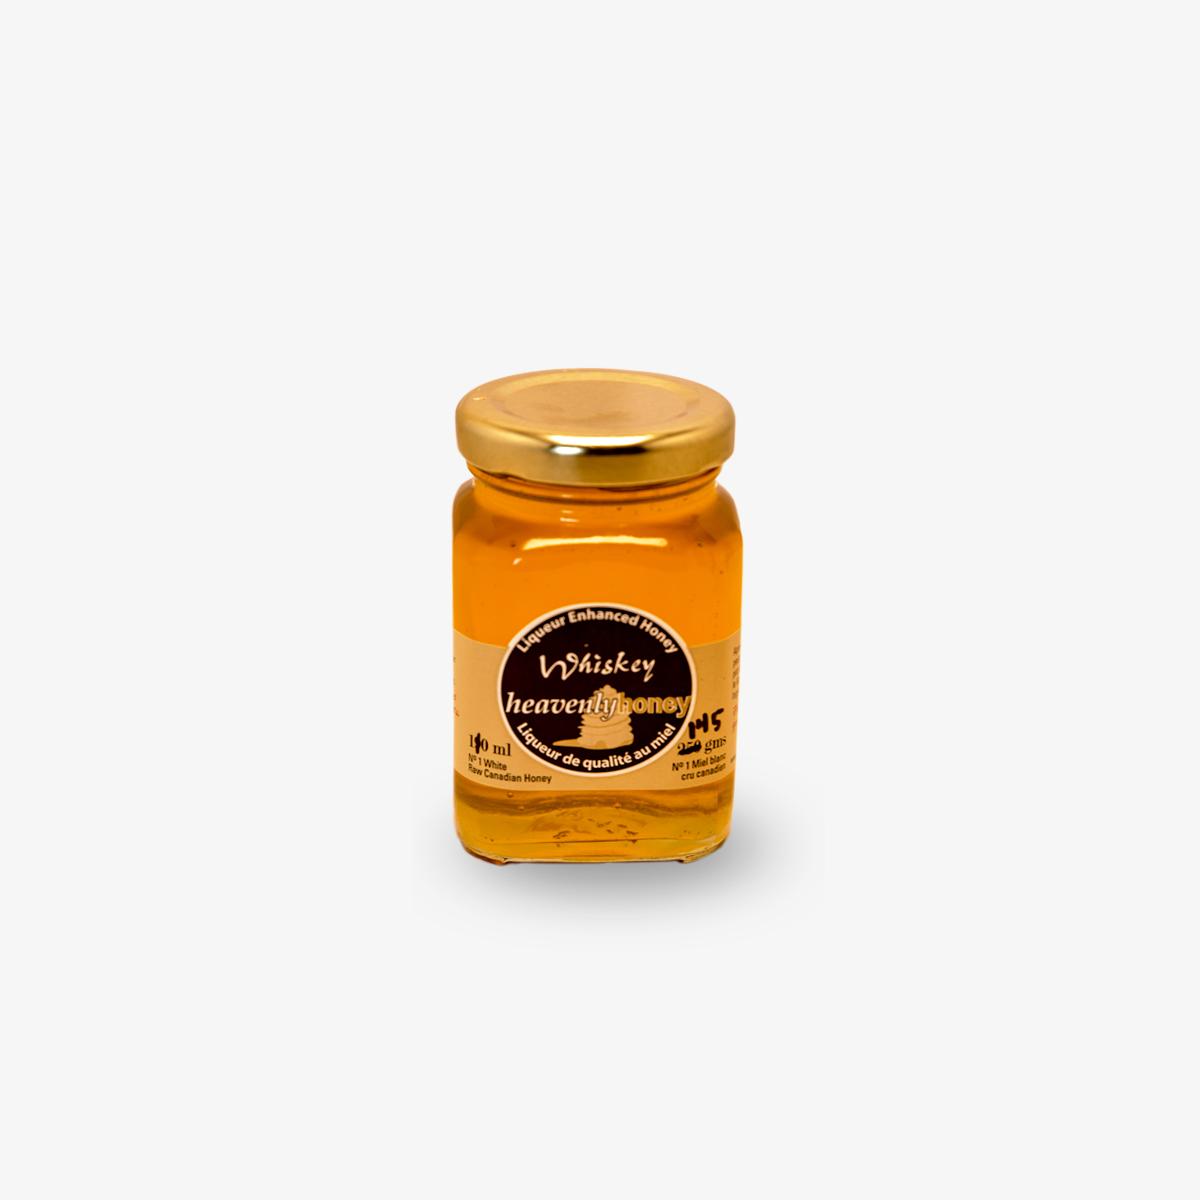 Heavenly Honey Whisky Honey